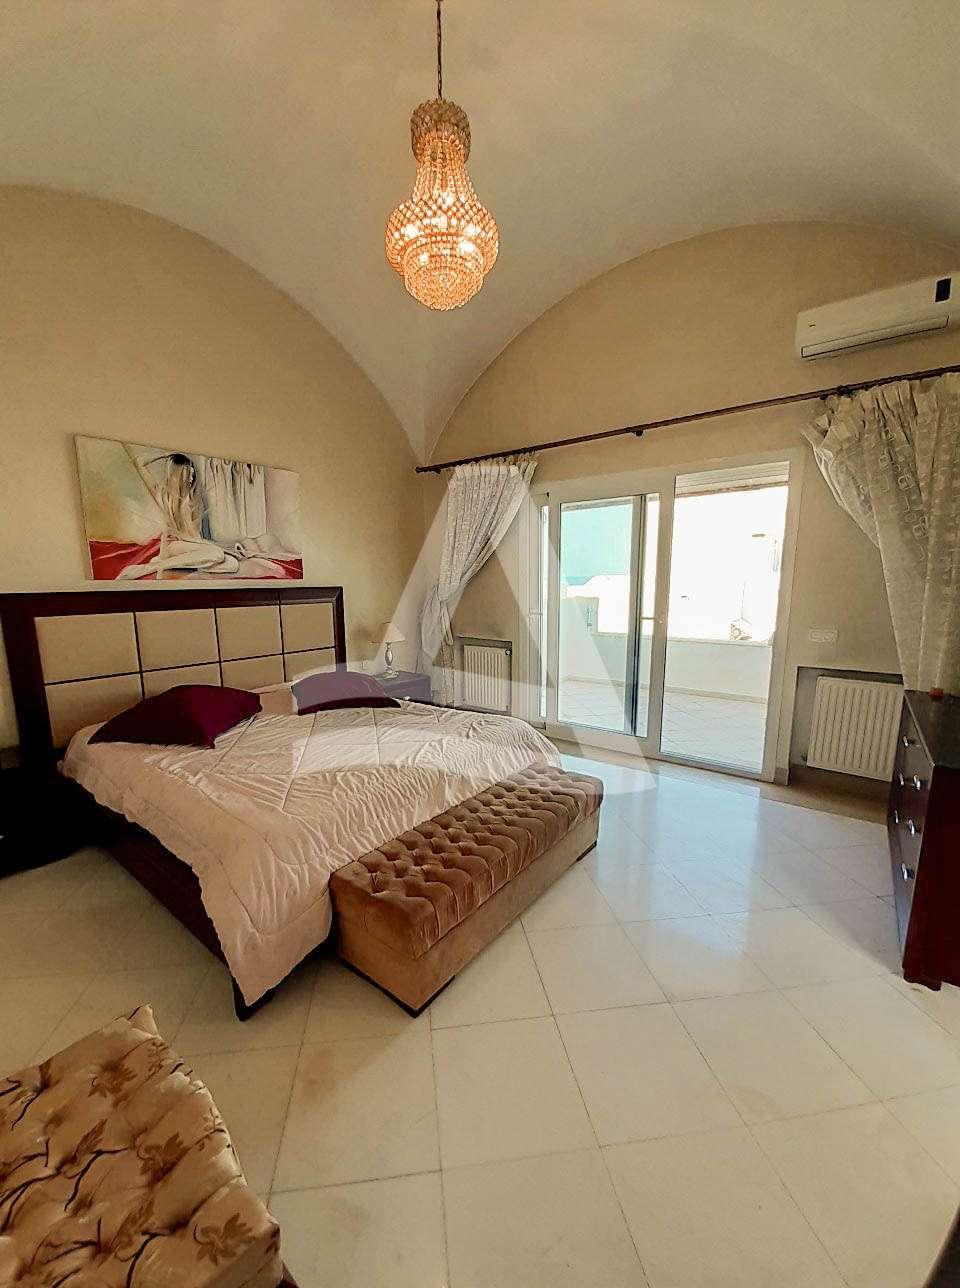 httpss3.amazonaws.comlogimoaws5655167551605774584Appartement_Marsa_Tunisie_-6-1